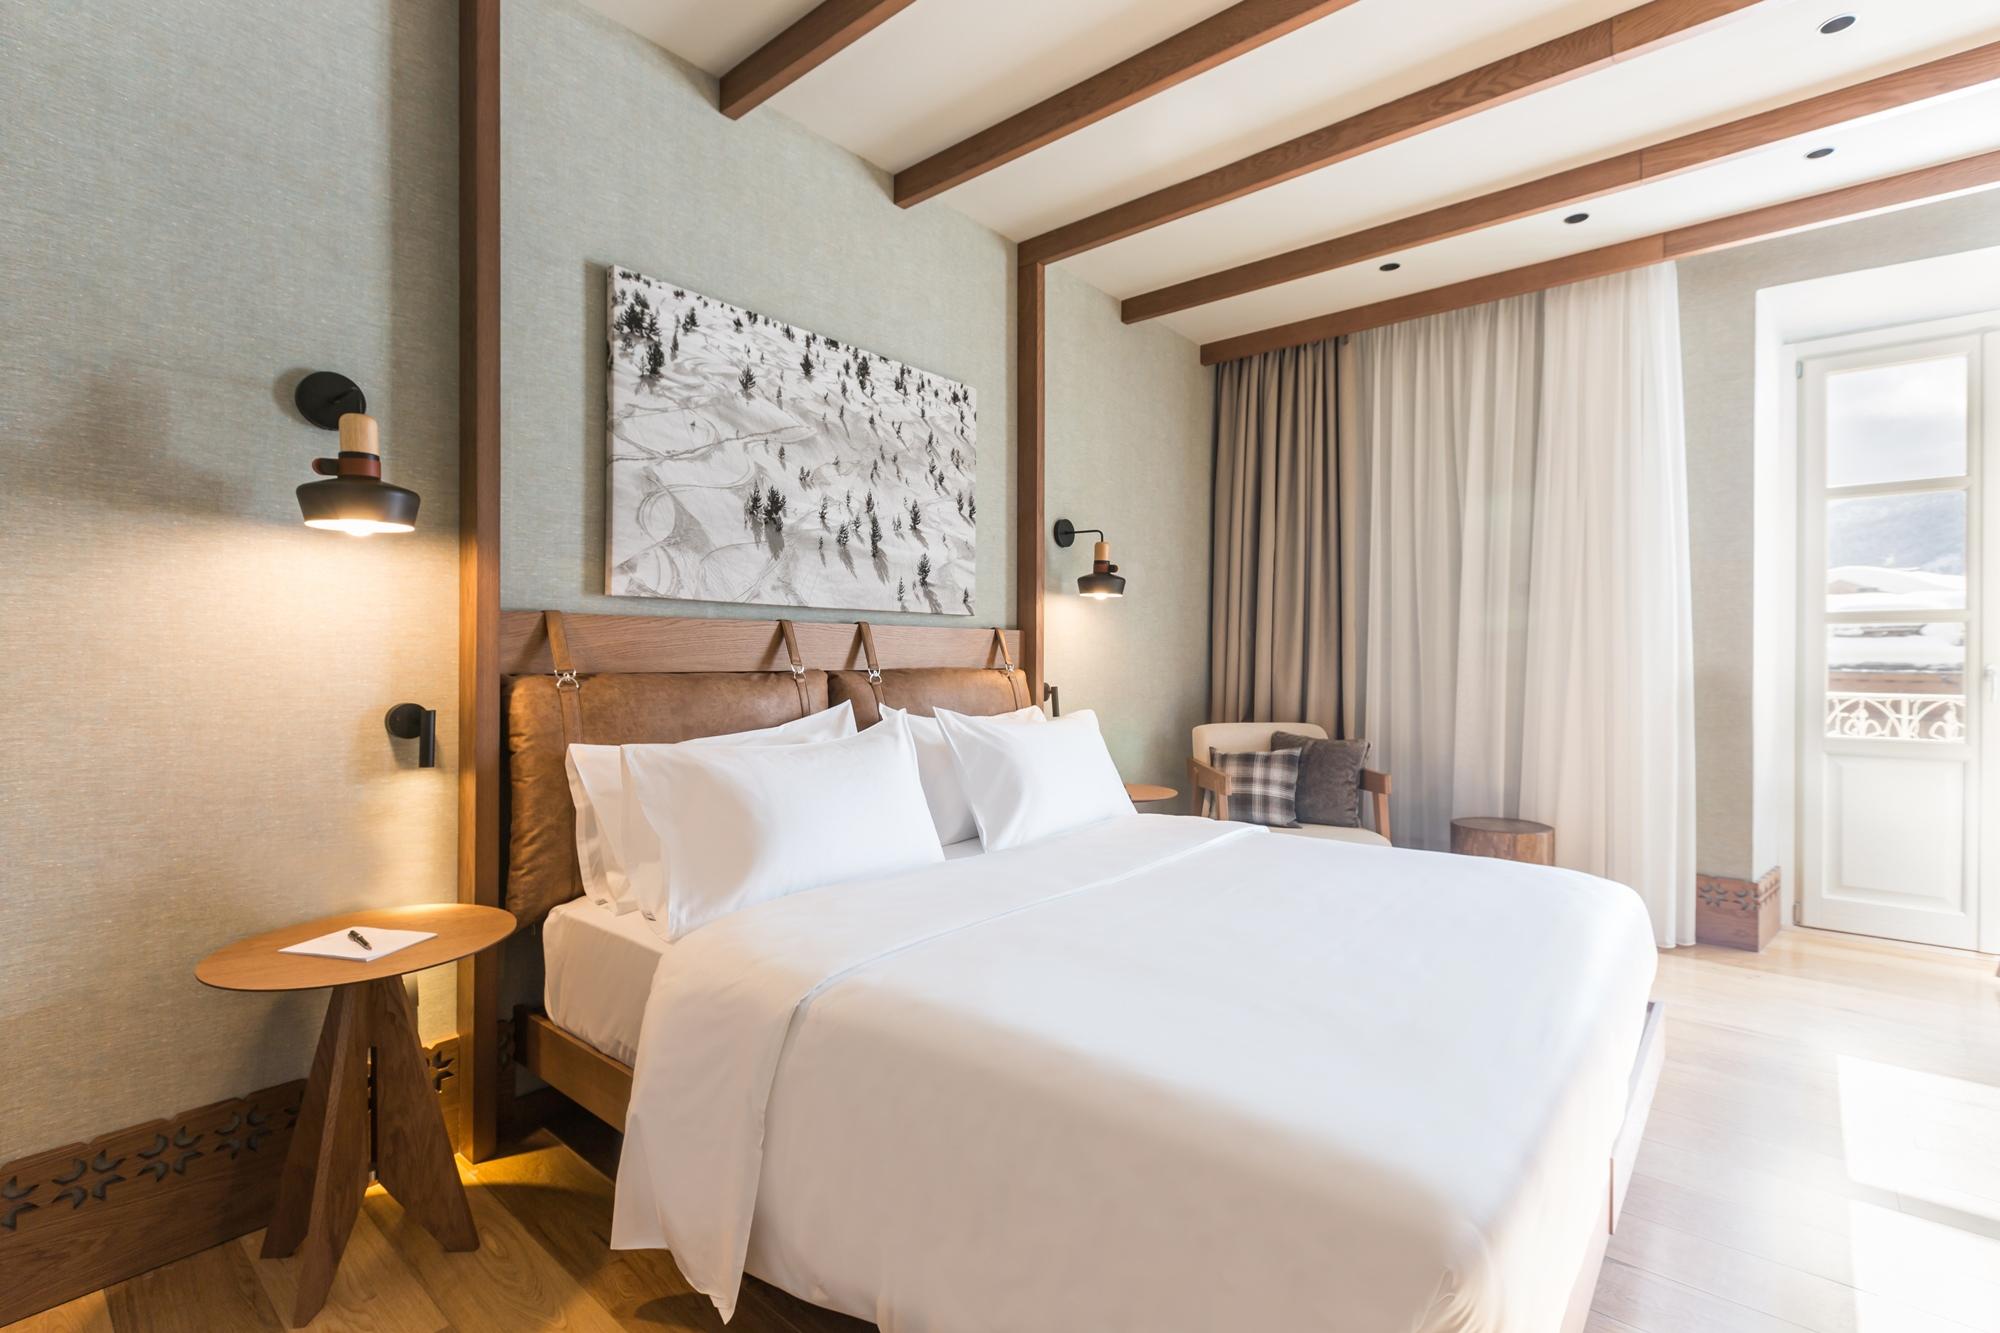 Radisson Grand Hotel Savoia